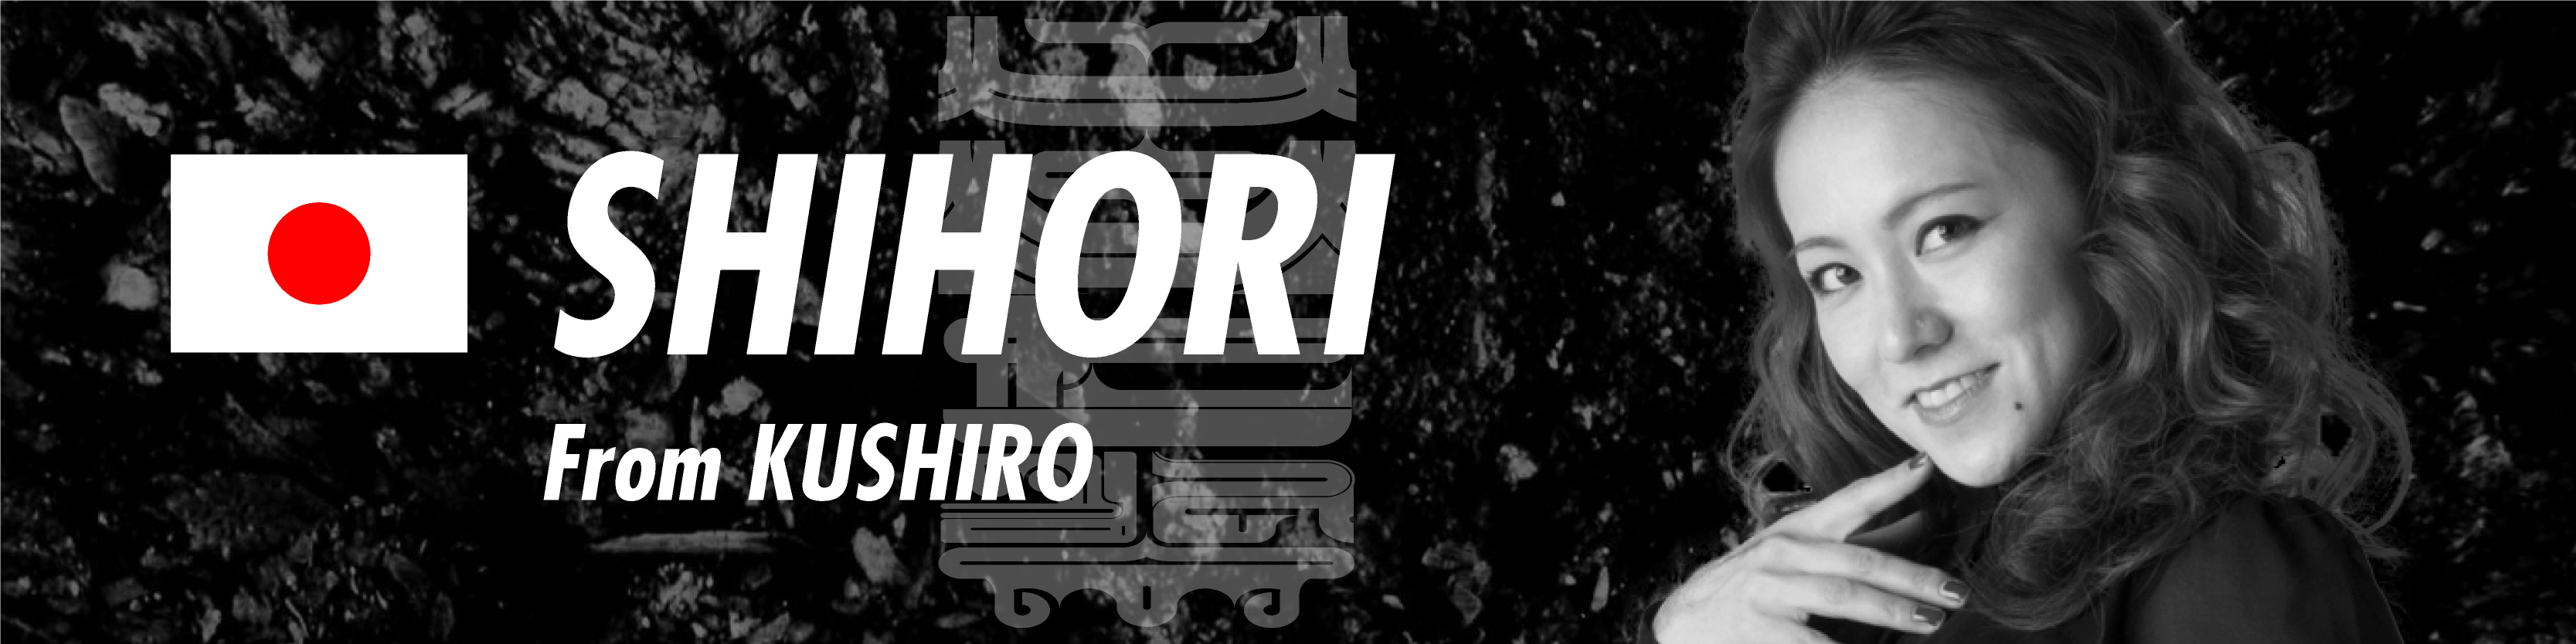 test001_Shihori